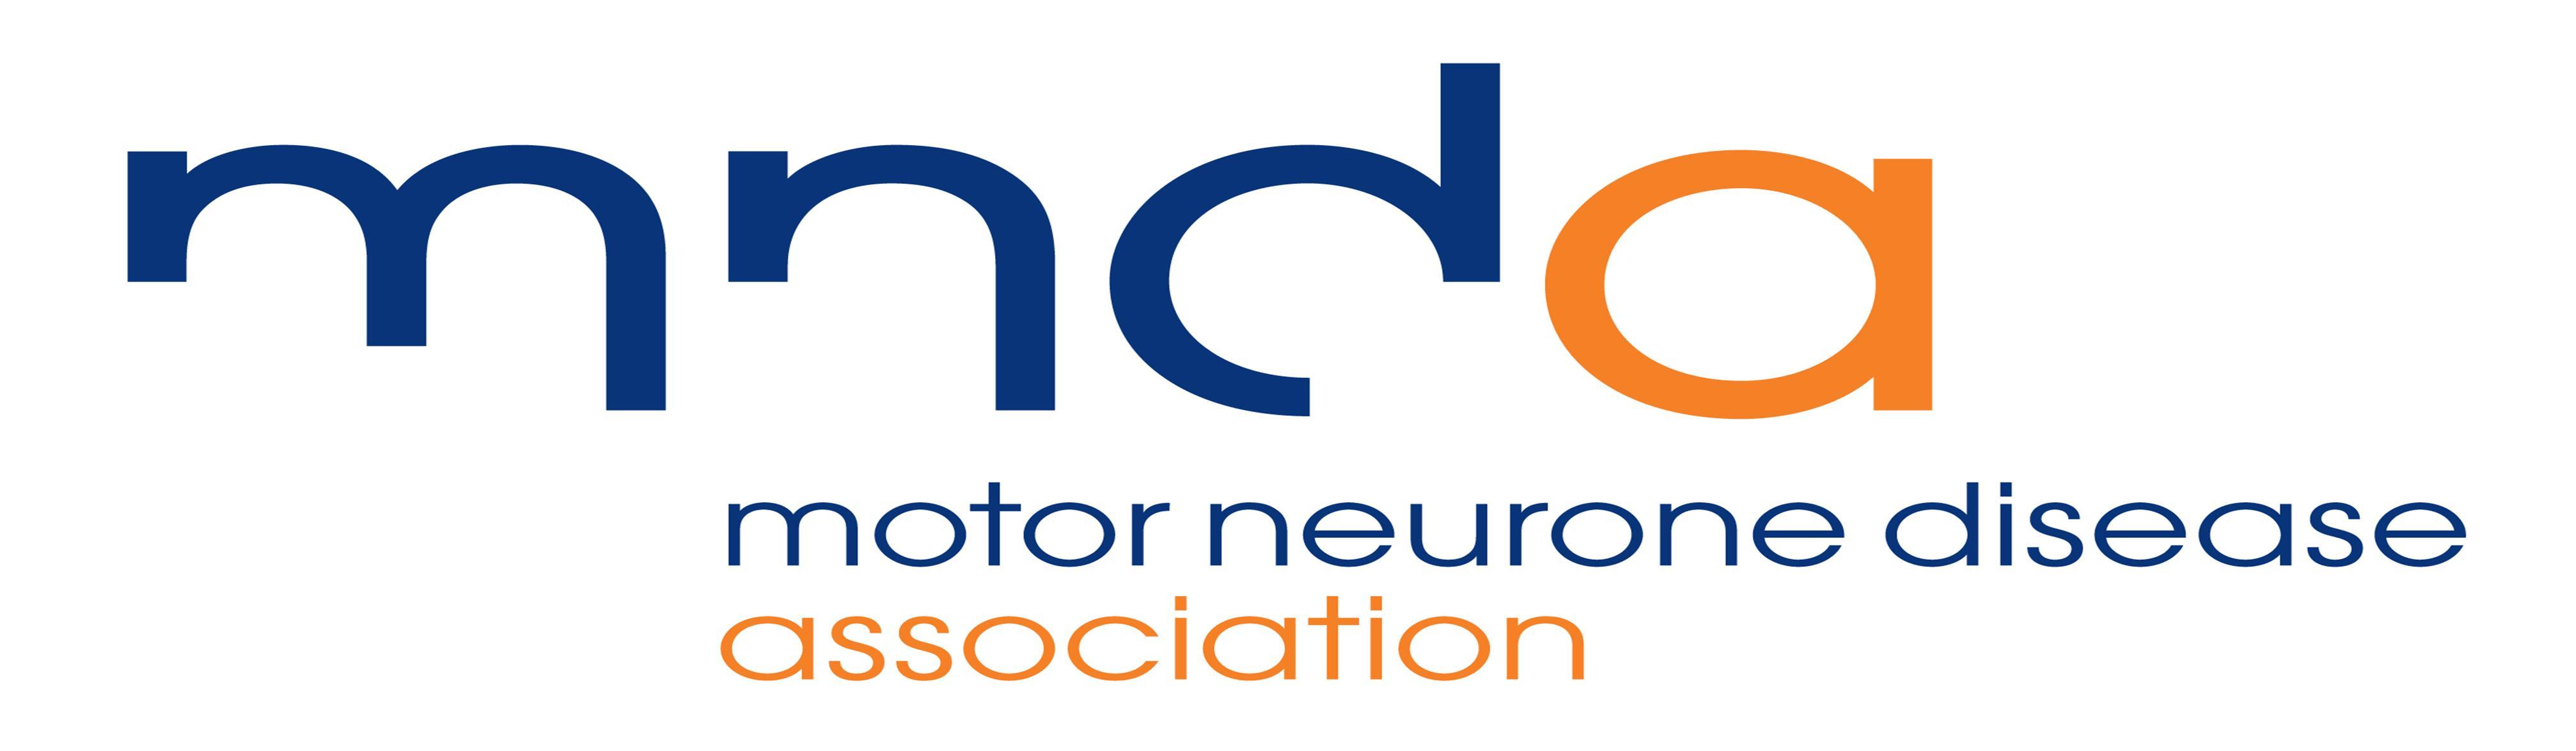 MNDA Charity Logo